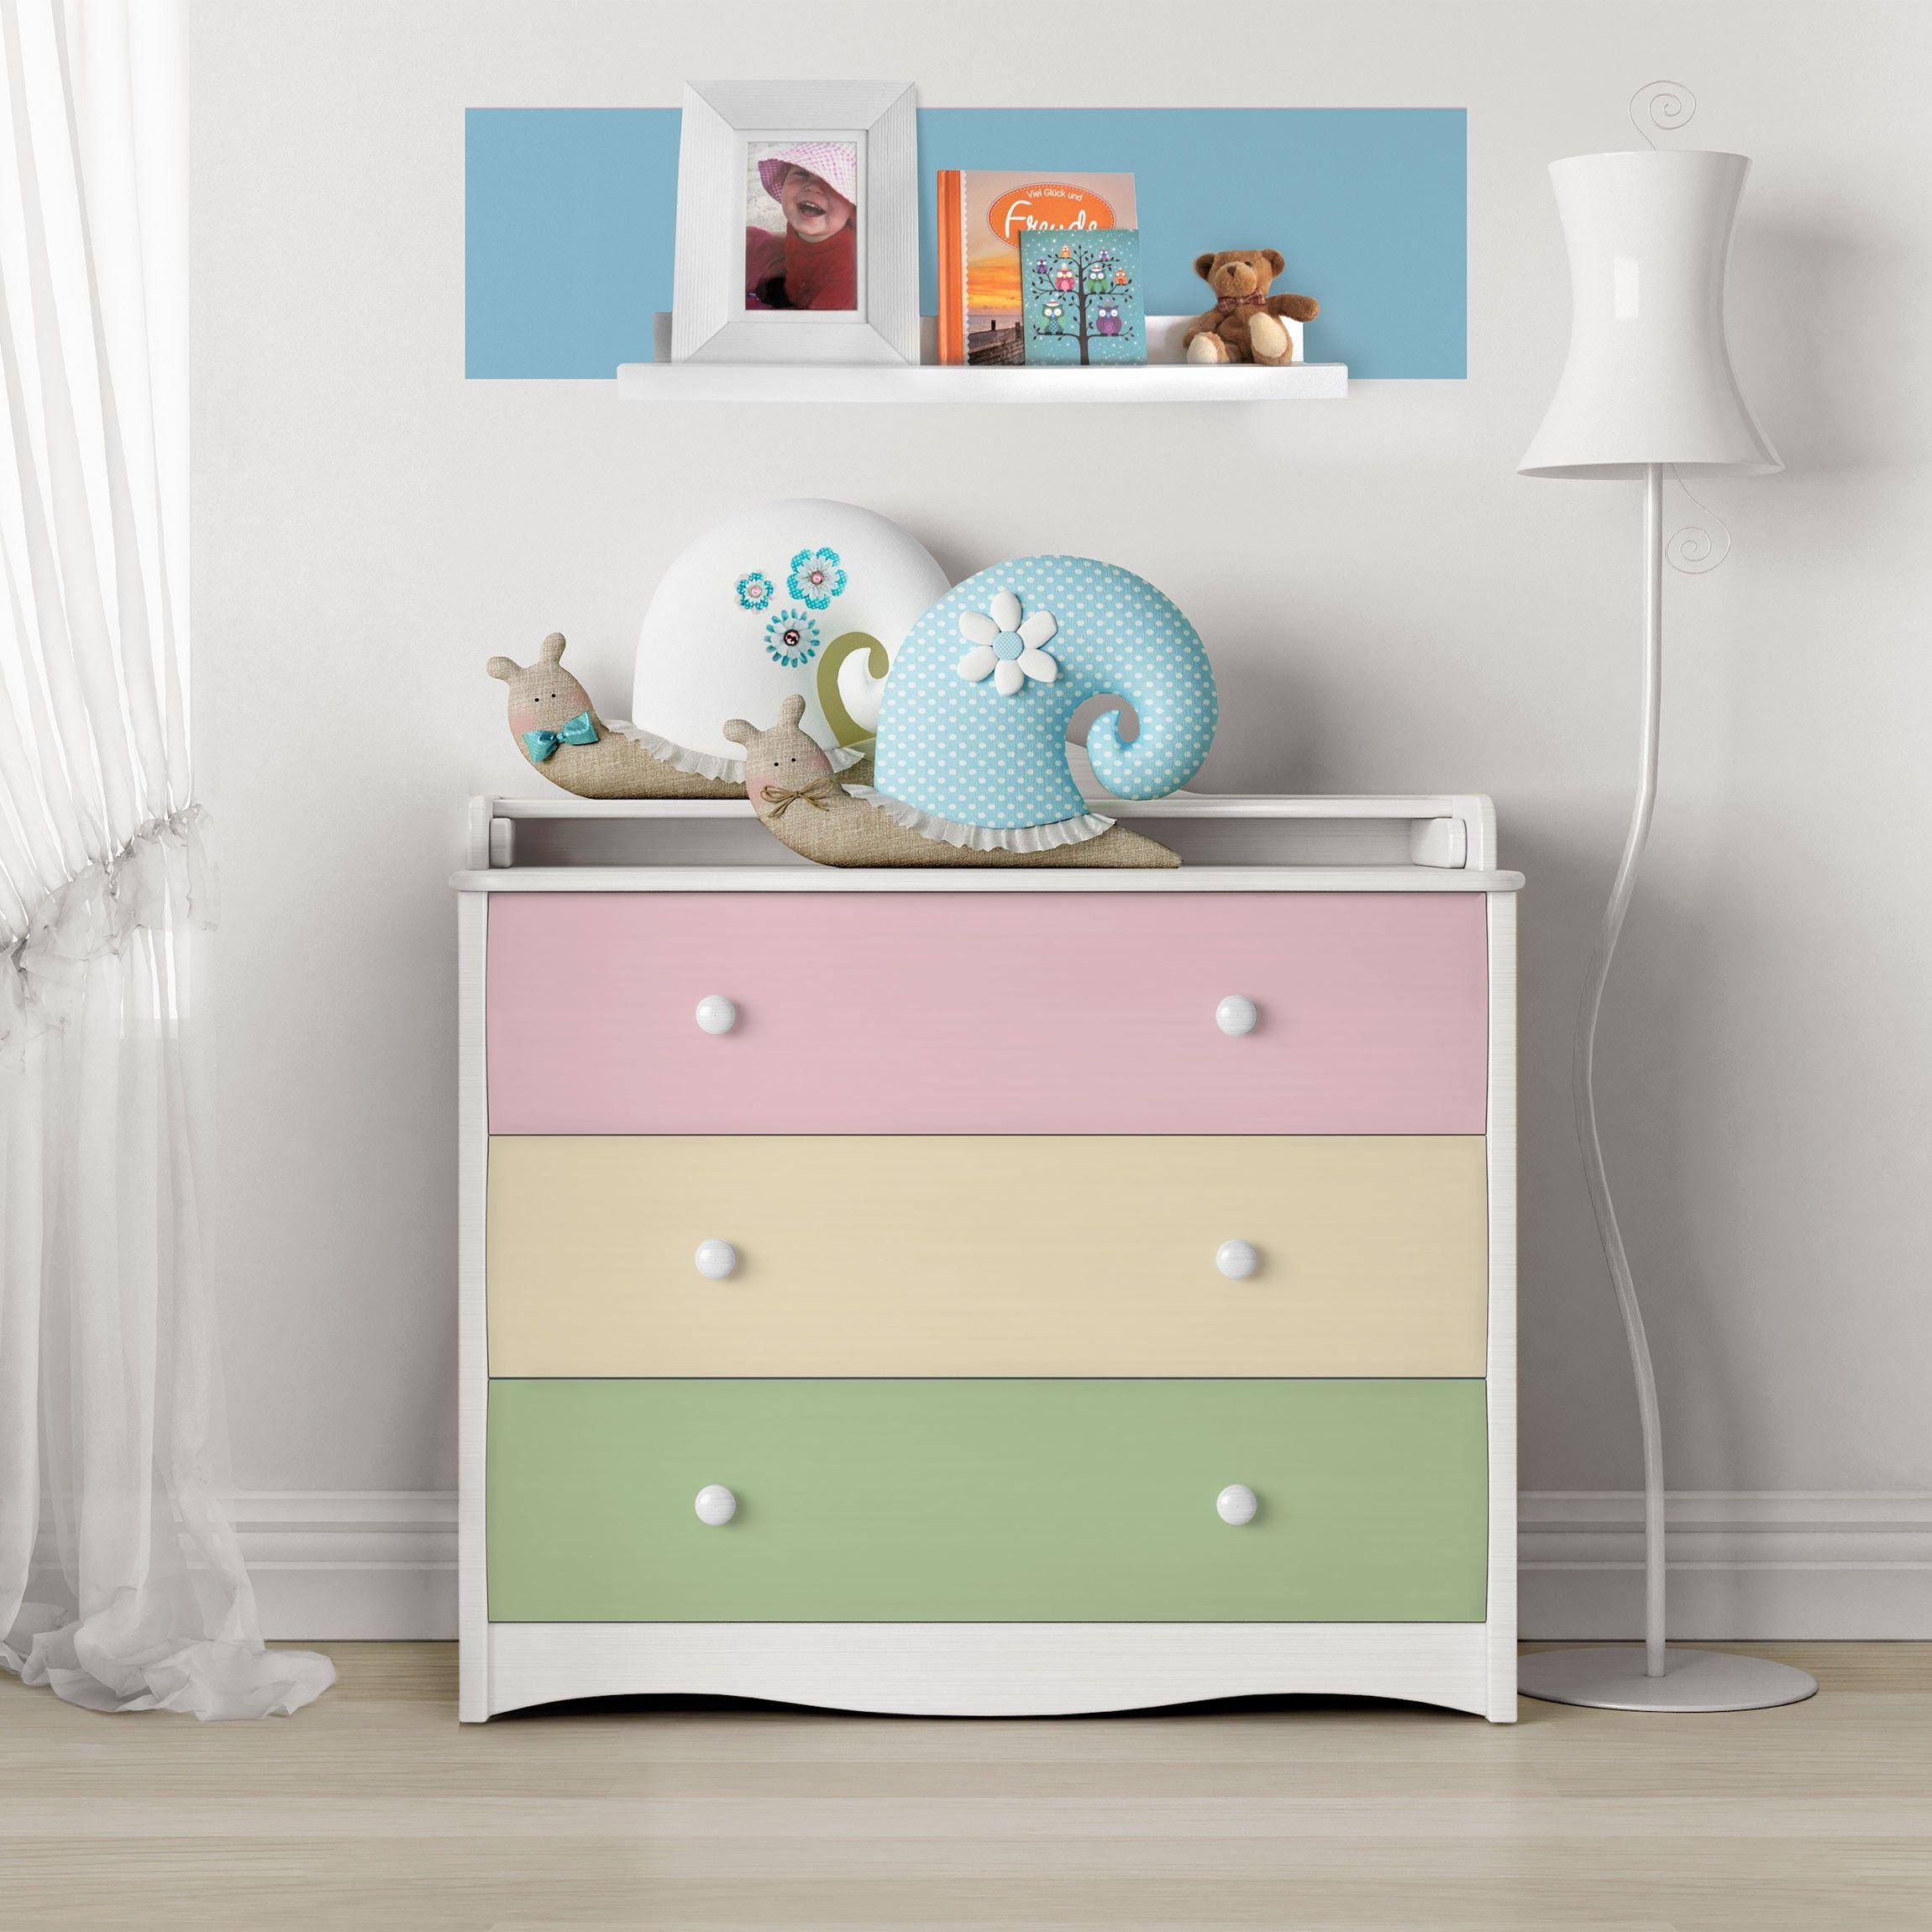 Carta Adesiva per Mobili Set of 4 beautiful pastel